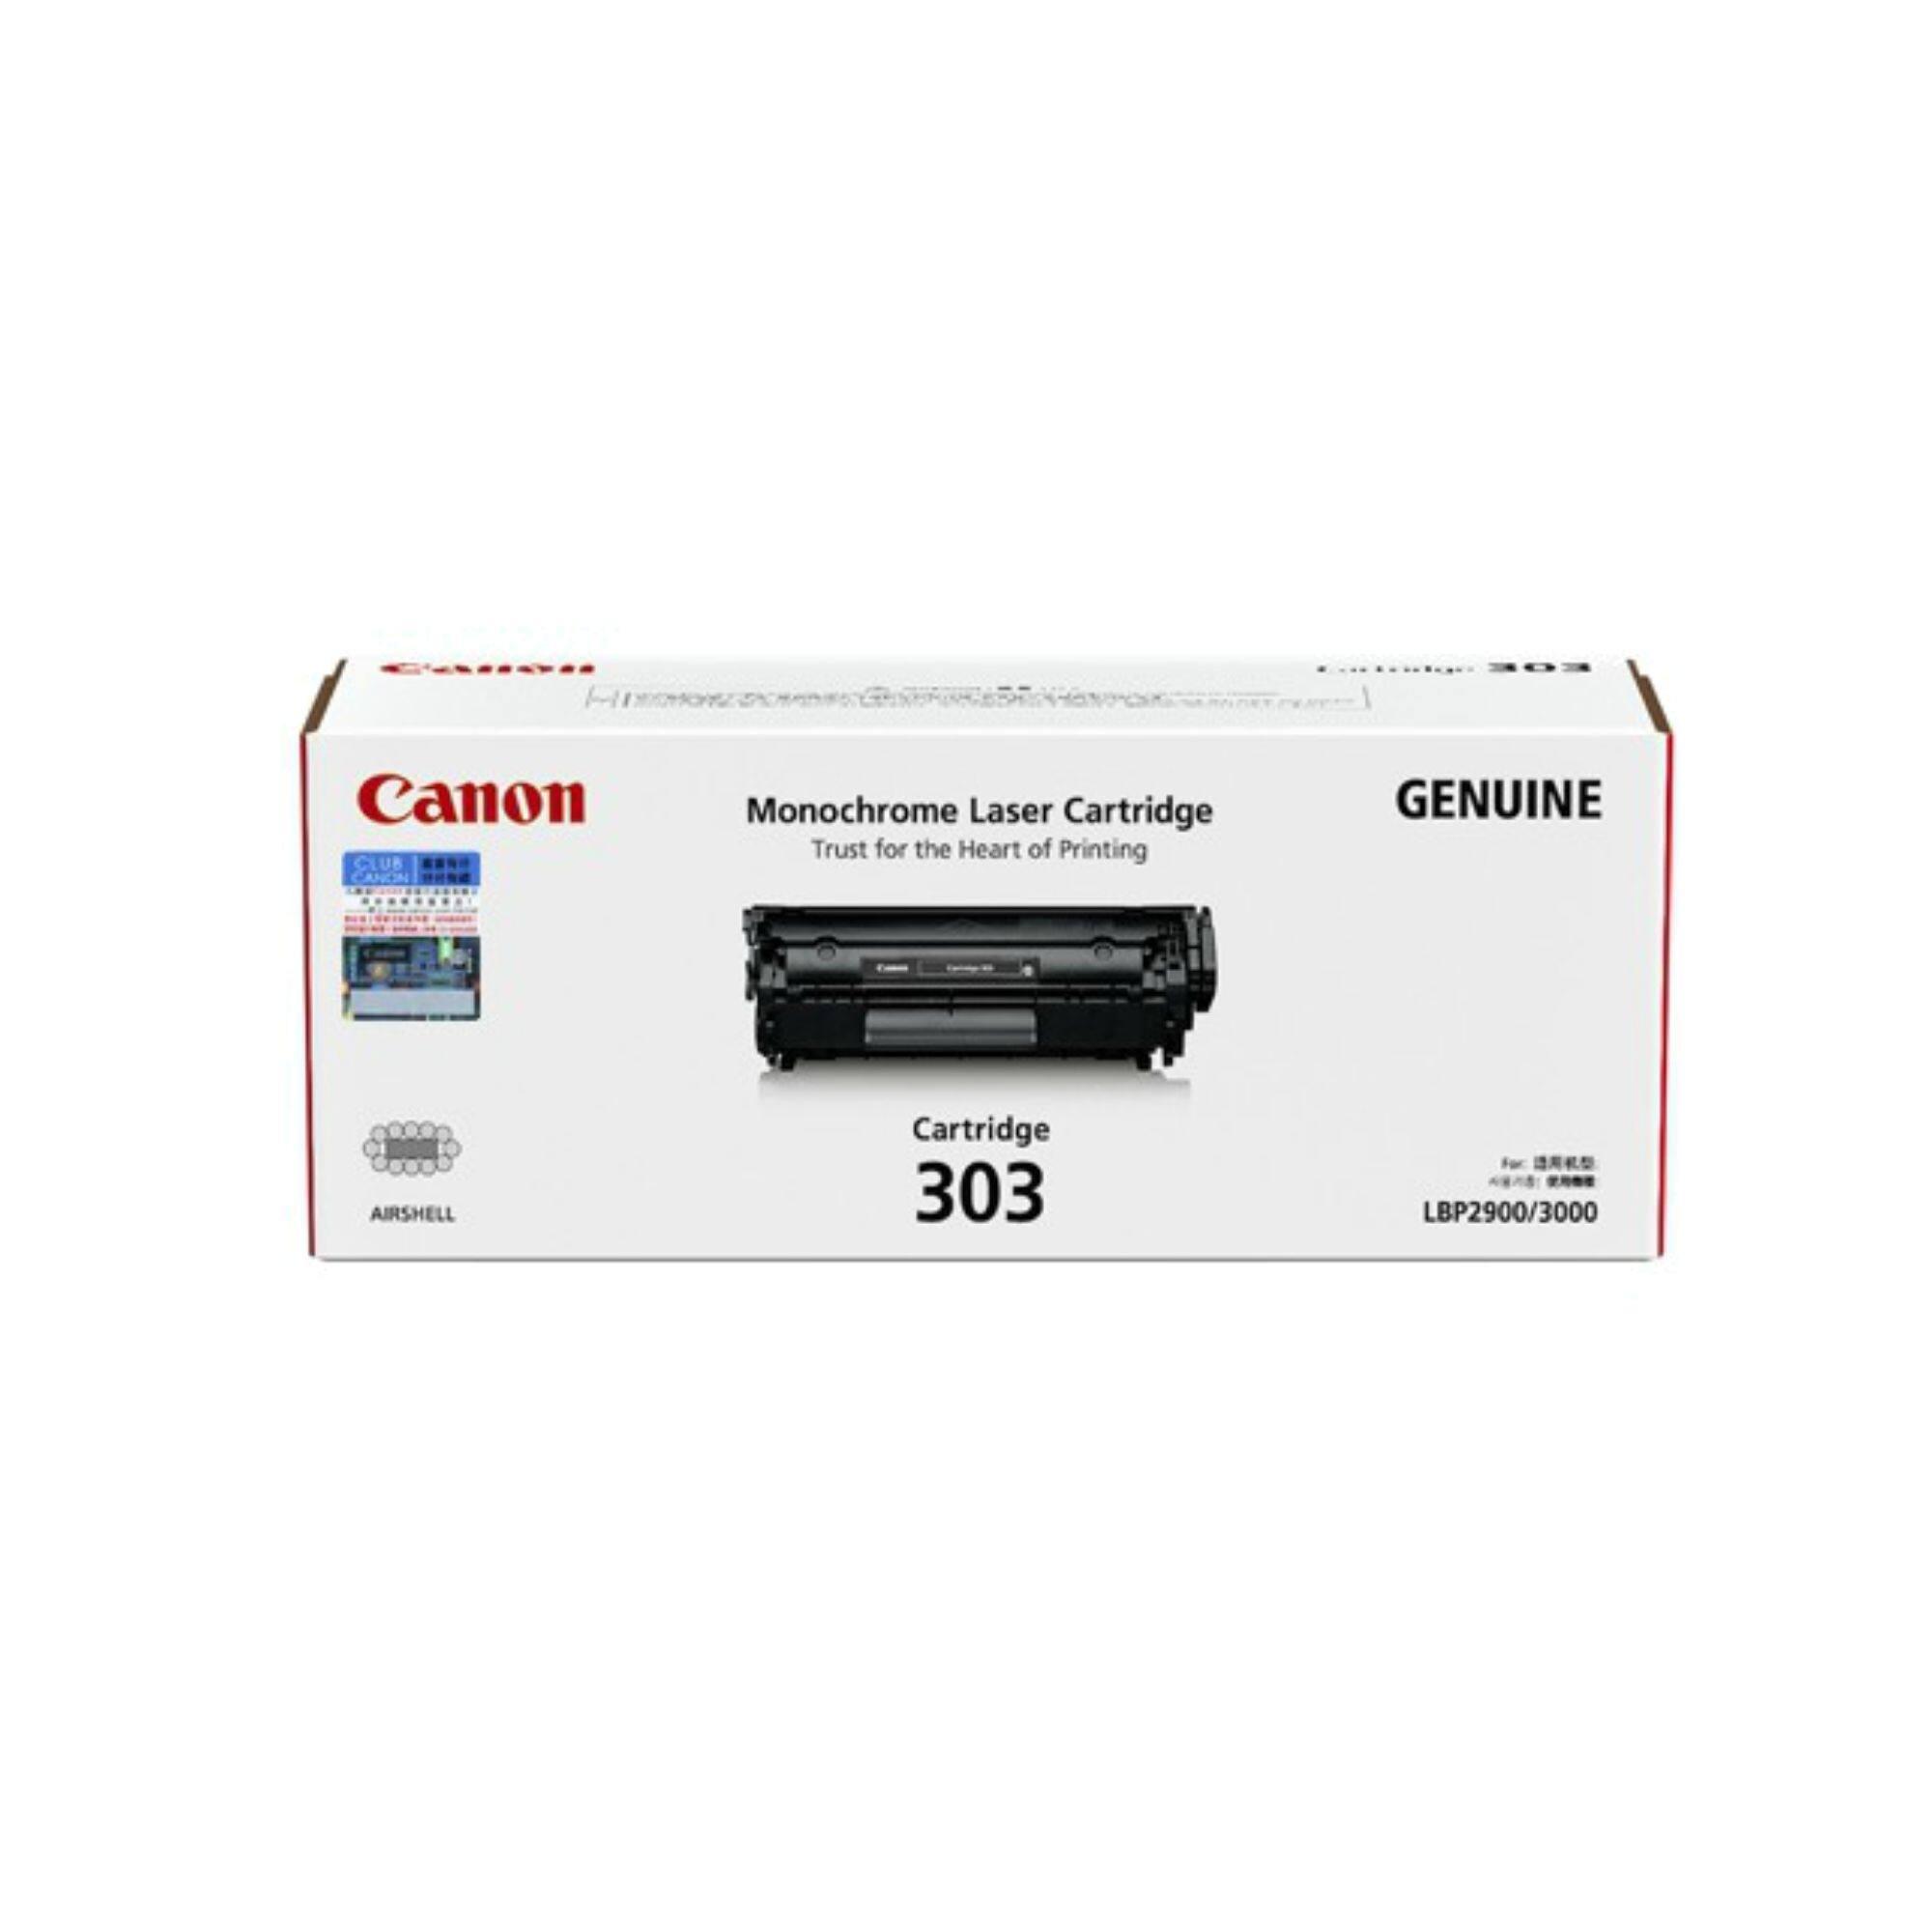 Canon Cart 303 Toner for LBP-2900 / LBP-3000 Printer